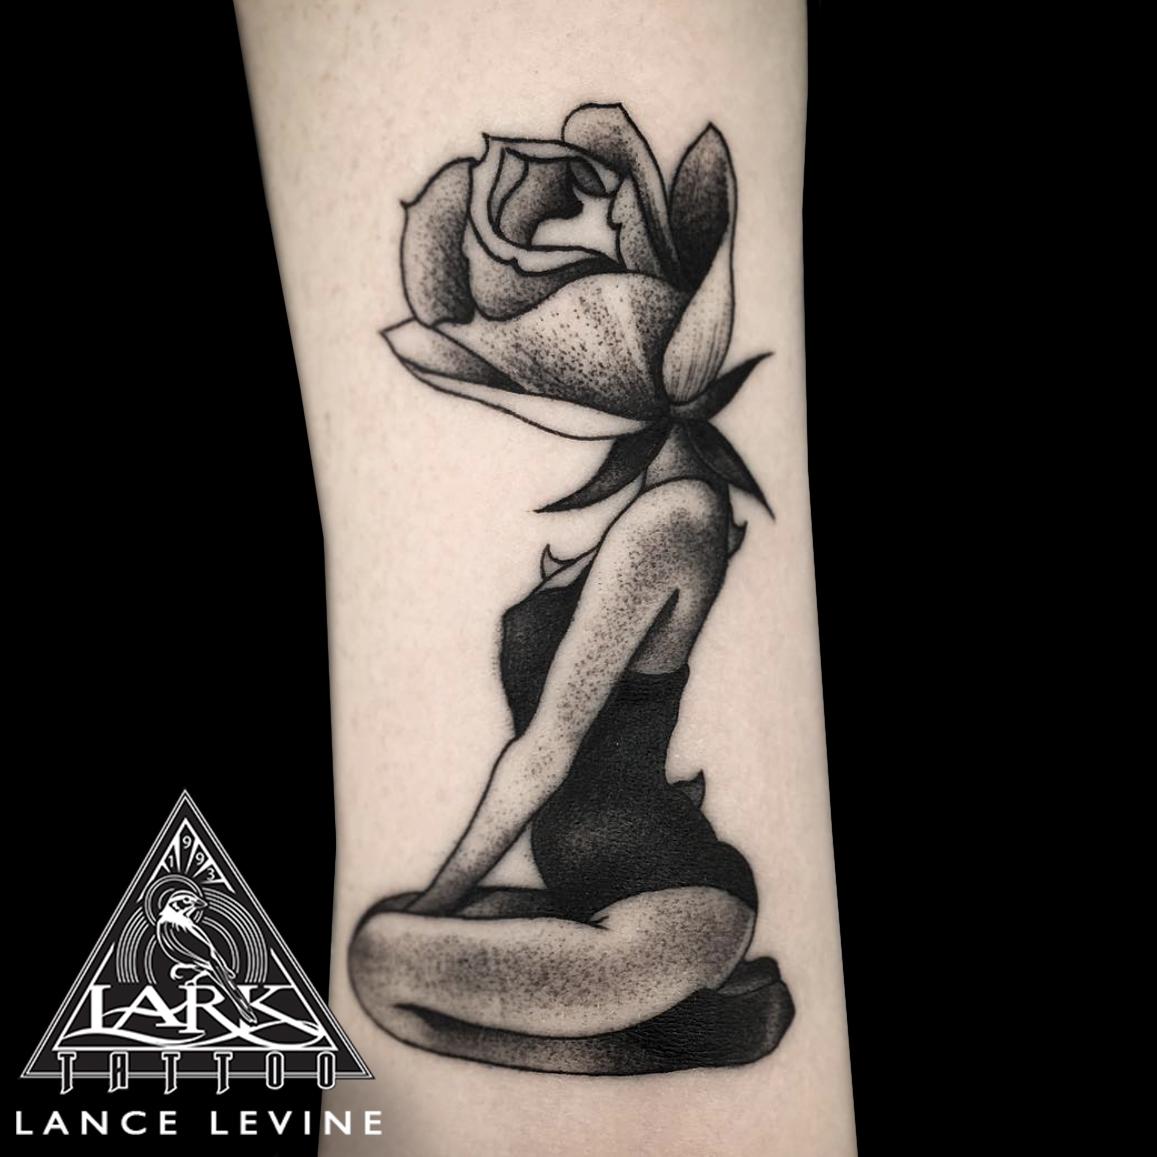 #lance #levine #lancelevine #rose #rosetattoo #womantattoo #odd #oddtattoo #bng #bngtattoo #blackandgreytattoo #blackandgraytattoo #bnginksociety #dotwork #dotworktattoo #blackworktattoo #blackworkers #tattoo #tattoos #tat #tats #tatts #tatted #tattedup #tattoist #tattooed #inked #inkedup #ink #tattoooftheday #amazingink #bodyart #tattooig #tattoosofinstagram #instatats #larktattoo #larktattoos #larktattoowestbury #westbury #longisland #NY #NewYork #usa #art